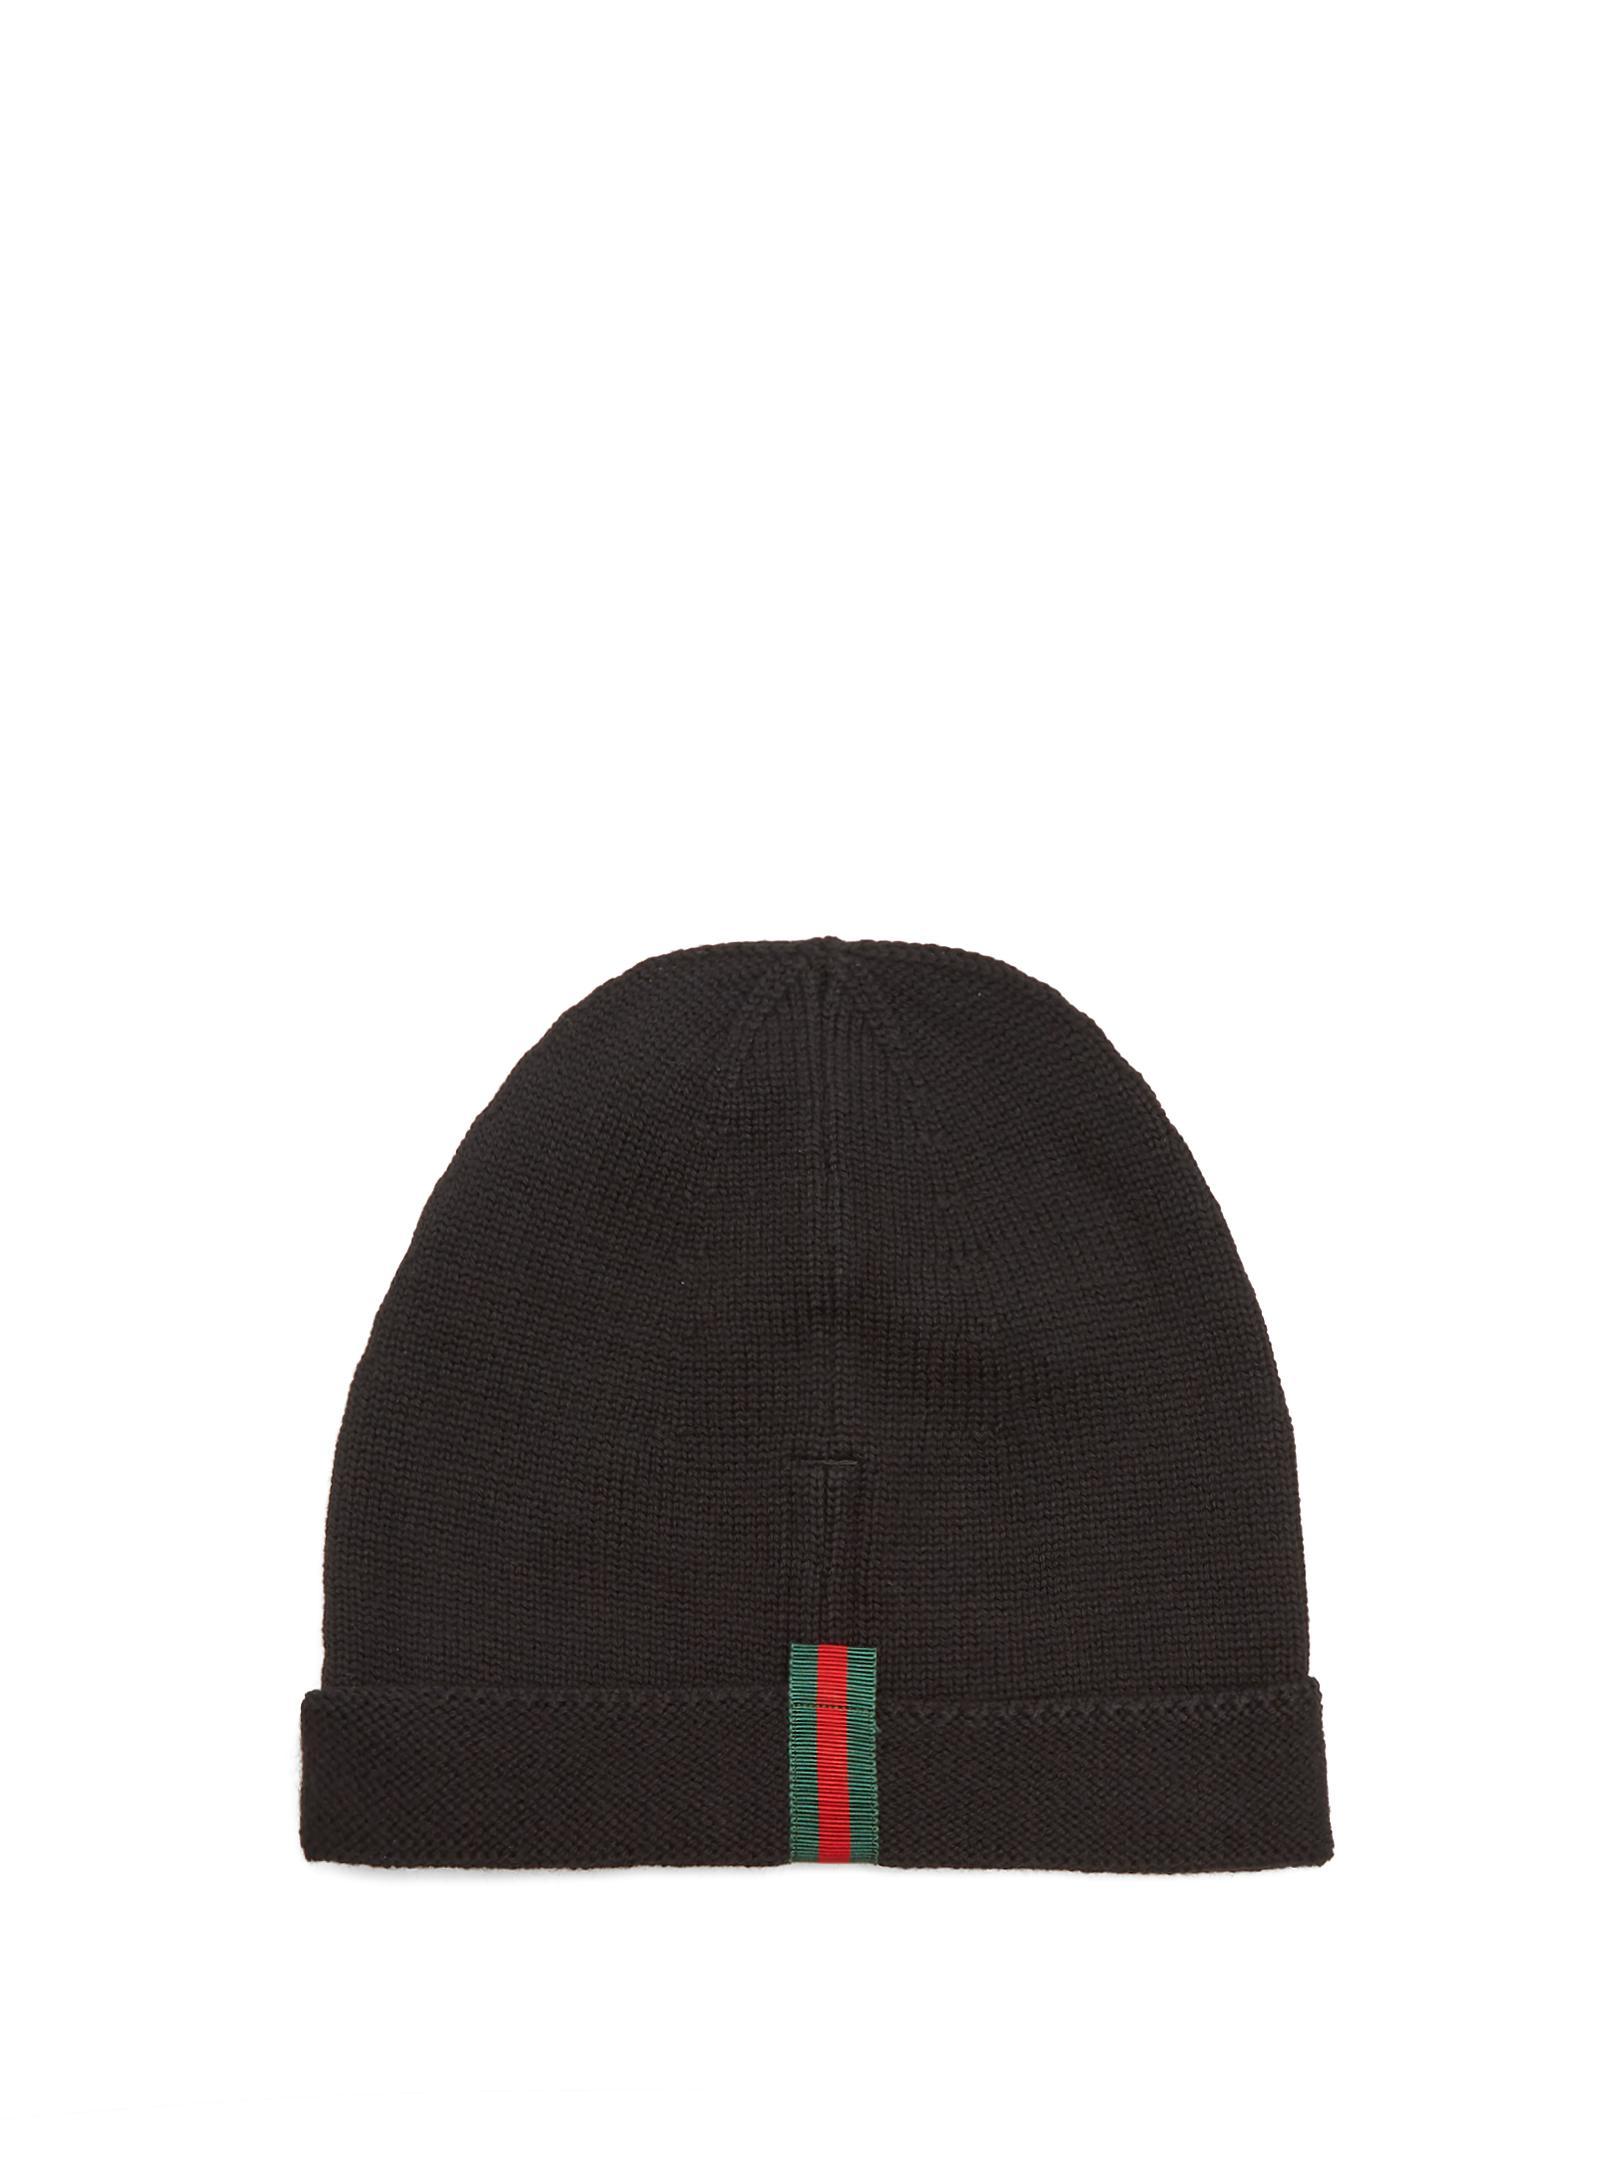 Gucci Web-trimmed Wool Beanie Hat in Black for Men - Lyst e2e63b3881c9